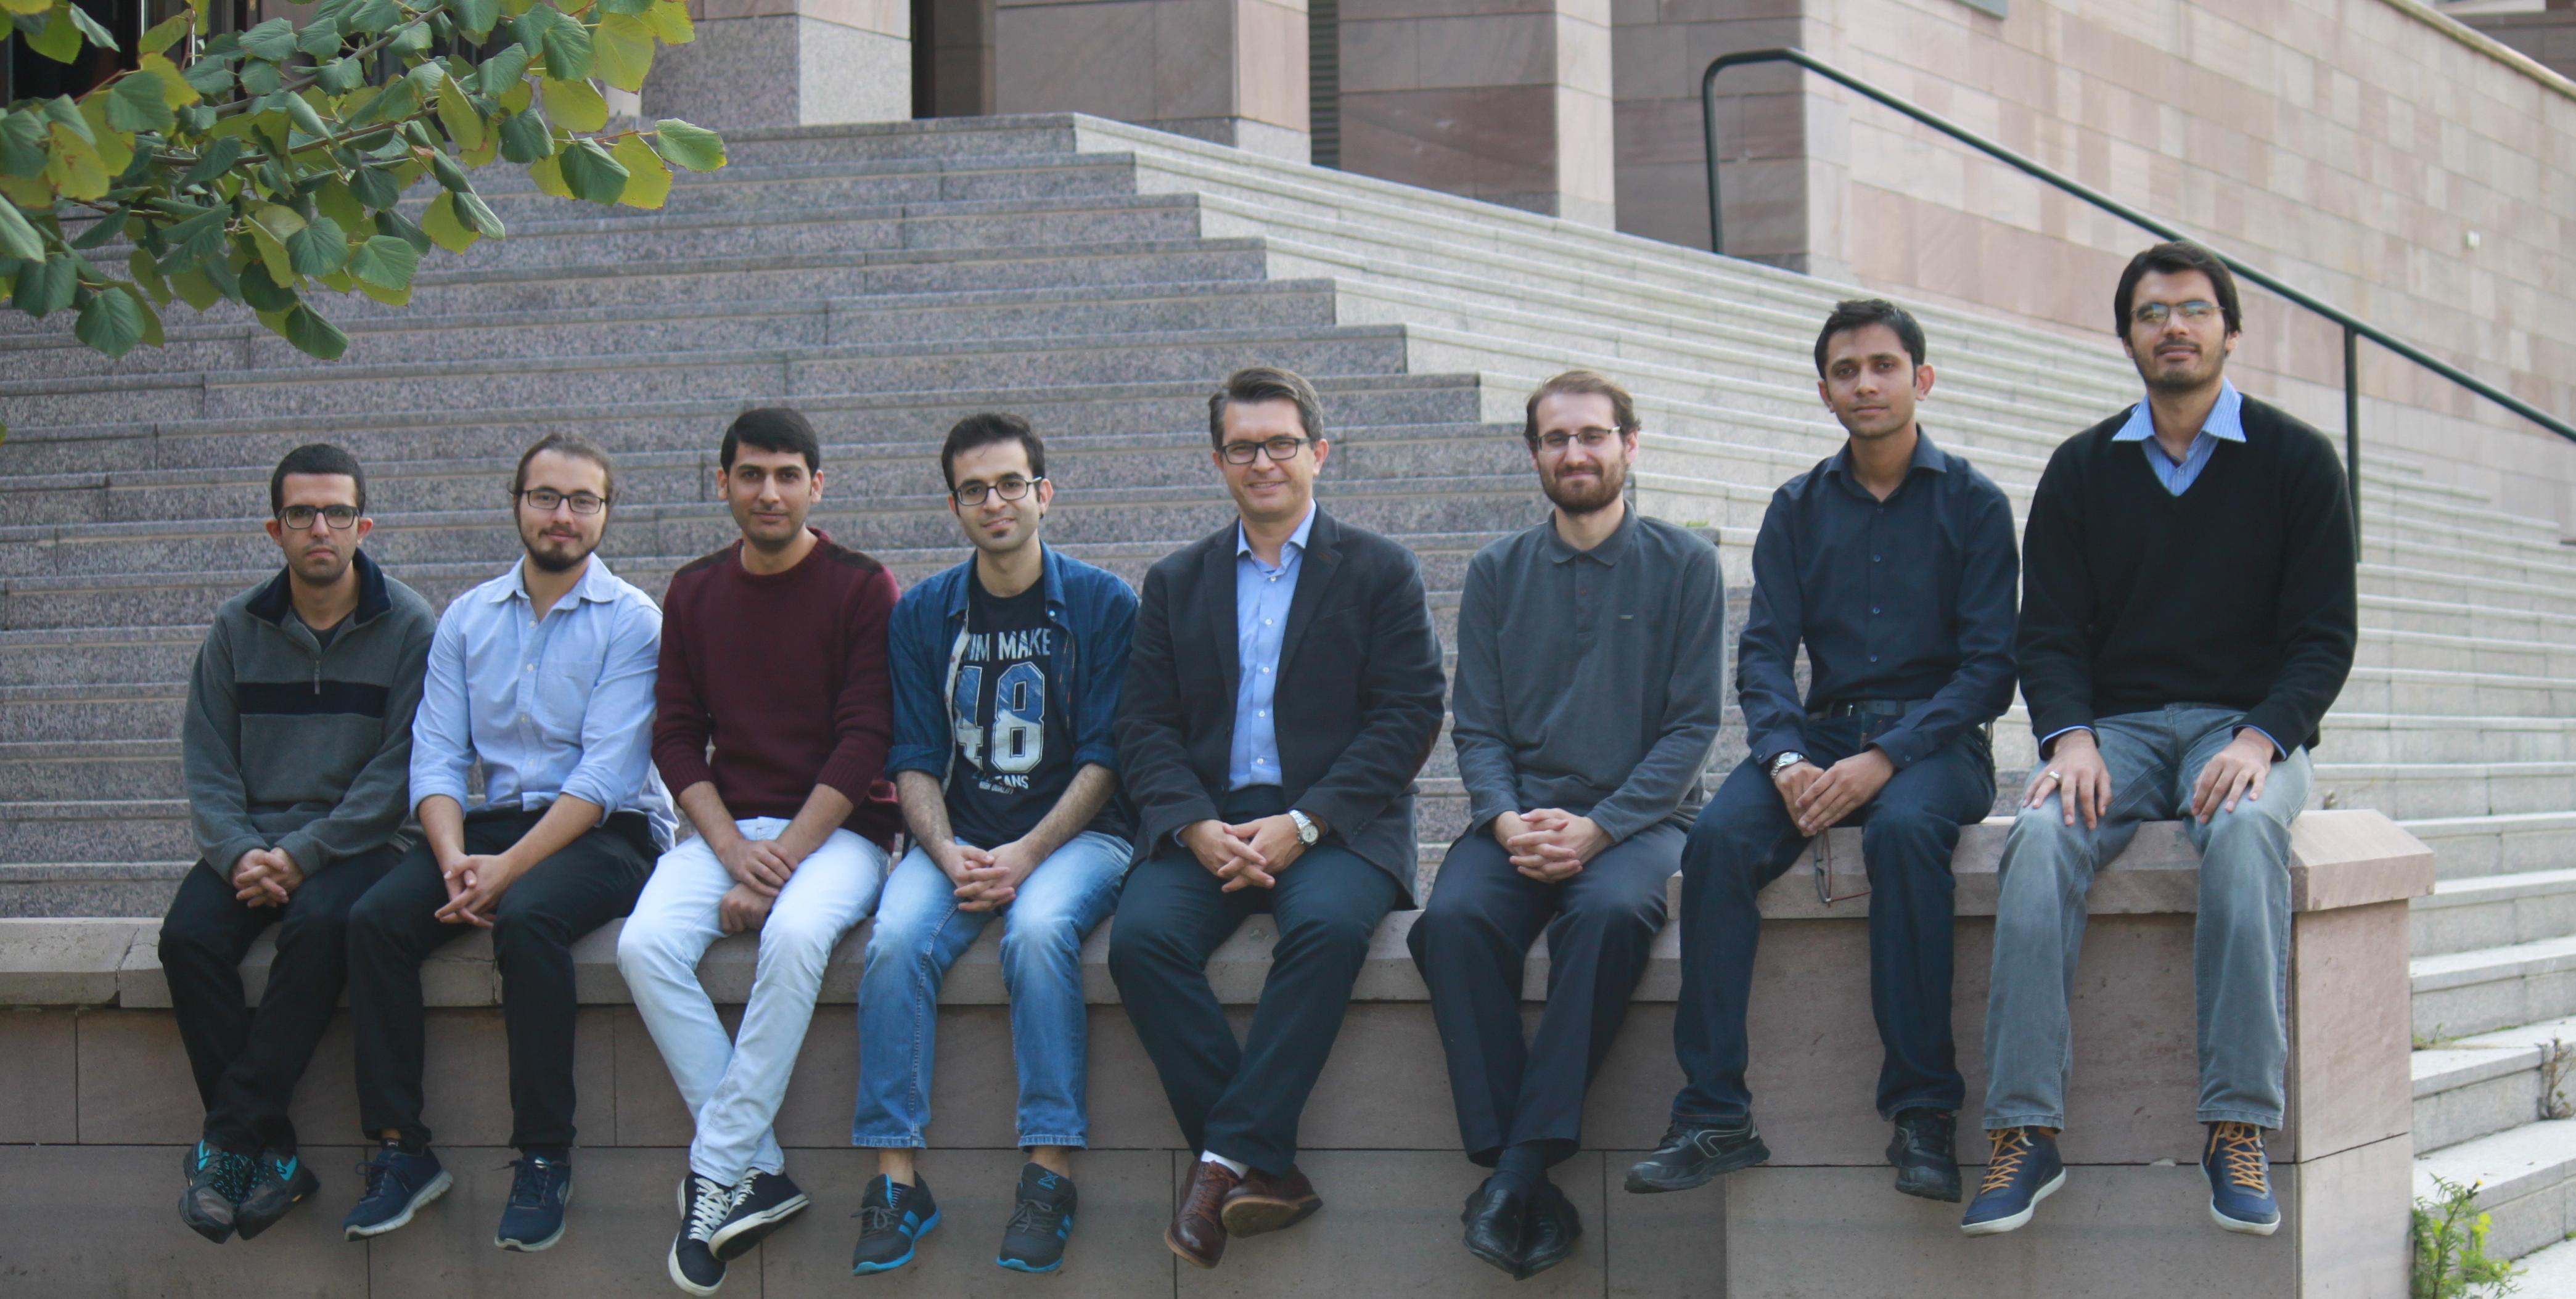 27 Oct. 2015, (from left to right) Mustafa Eryürek, Ayşenur Ateş, Suman Anand, Alper Kiraz, Adil Mustafa, M. Waqas Nawaz, M. Zeeshan Rashid